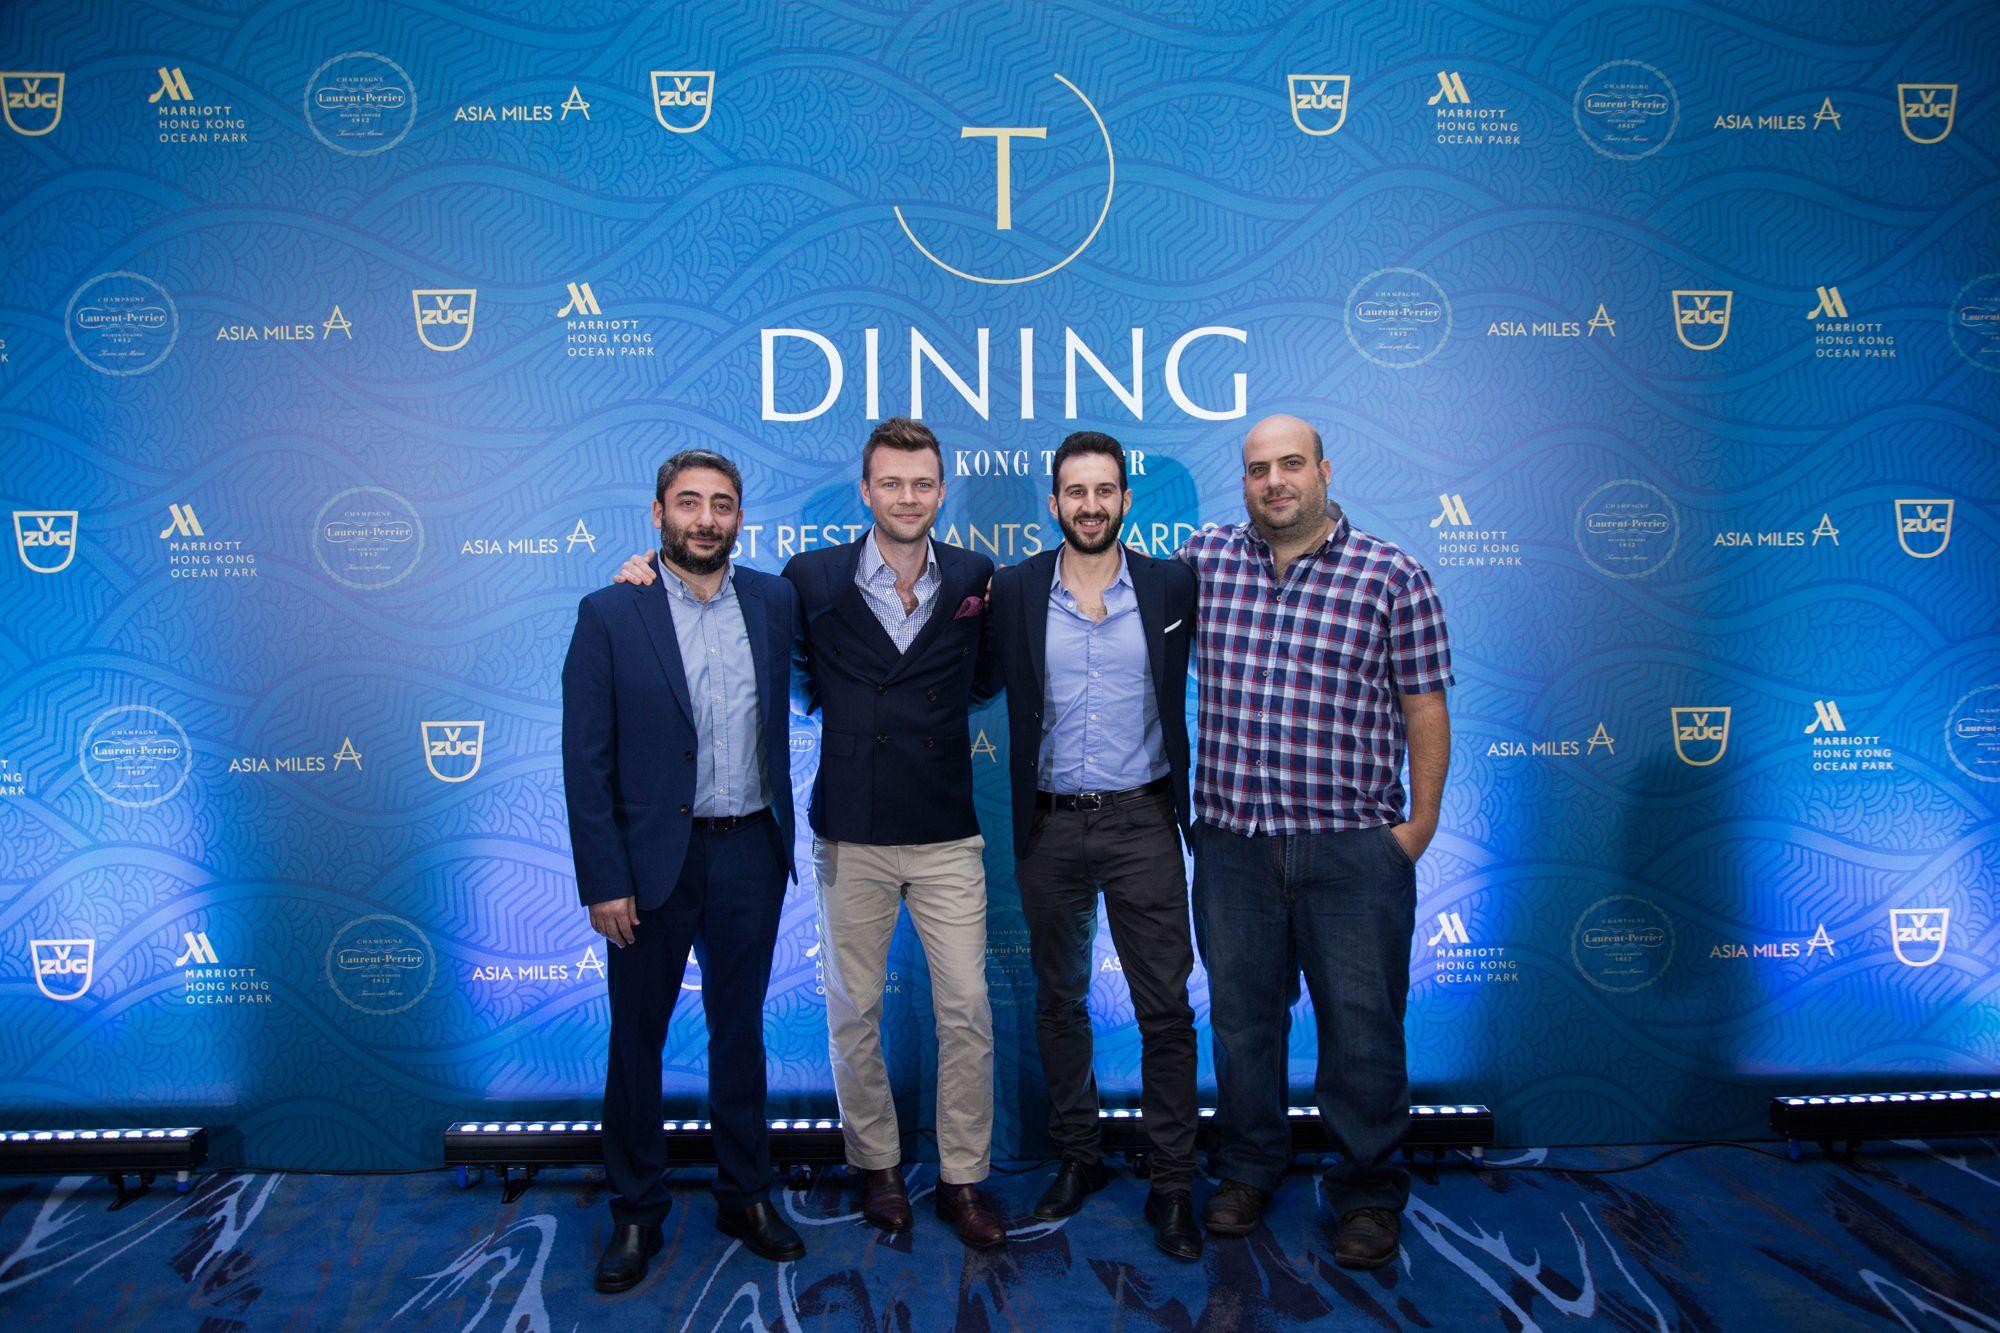 Jad Sfeir, James Ward, Simone Sammuri, Asher Goldstein